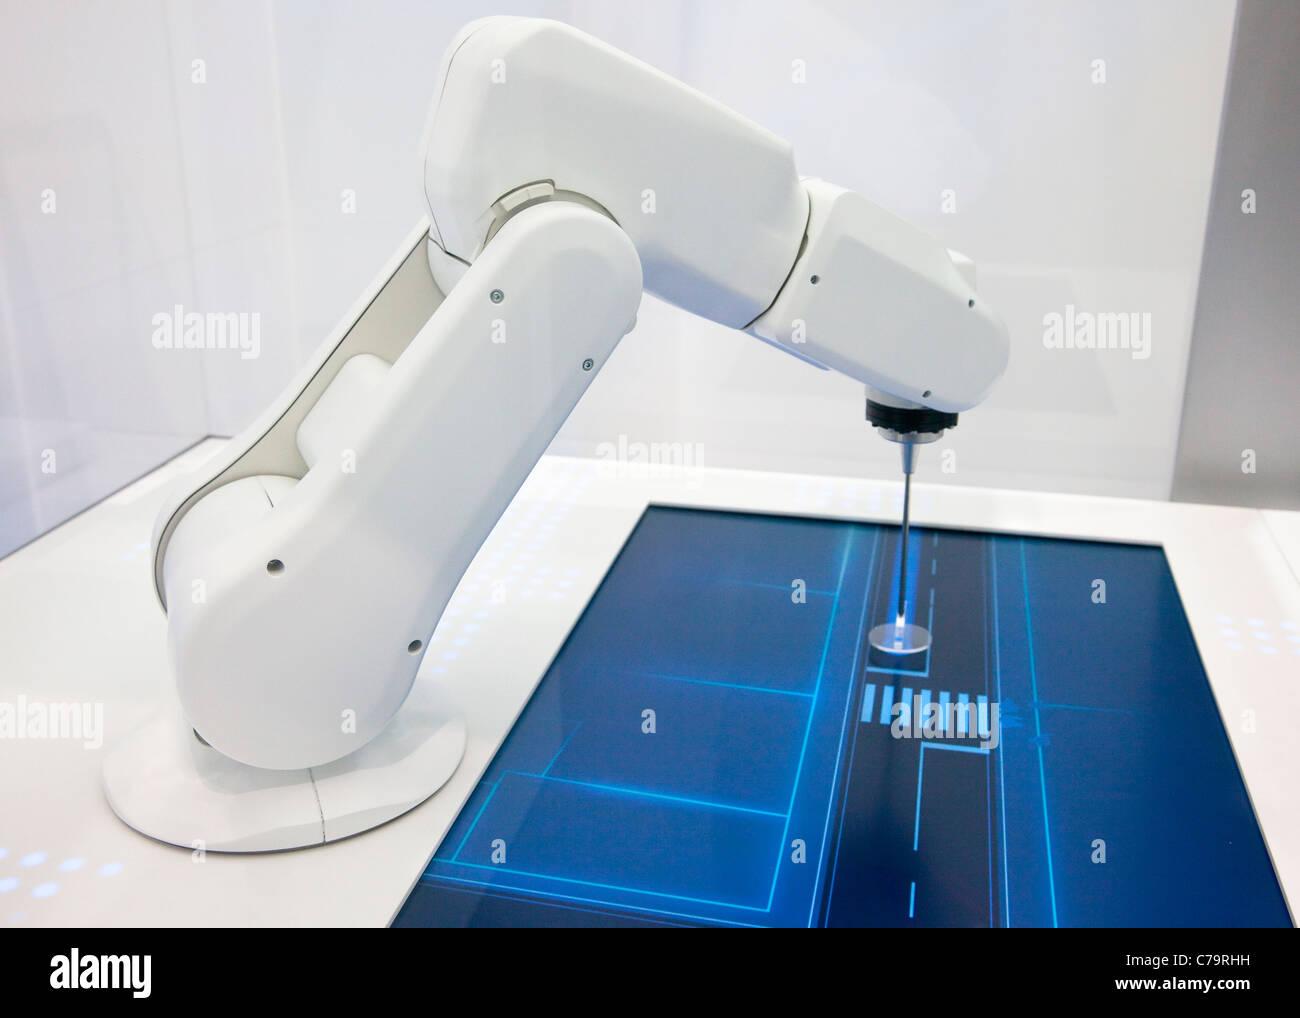 BMW Efficcient Dynamics Presentation with robot on the IAA 2011 International Motor Show in Frankfurt am Main, Germany - Stock Image